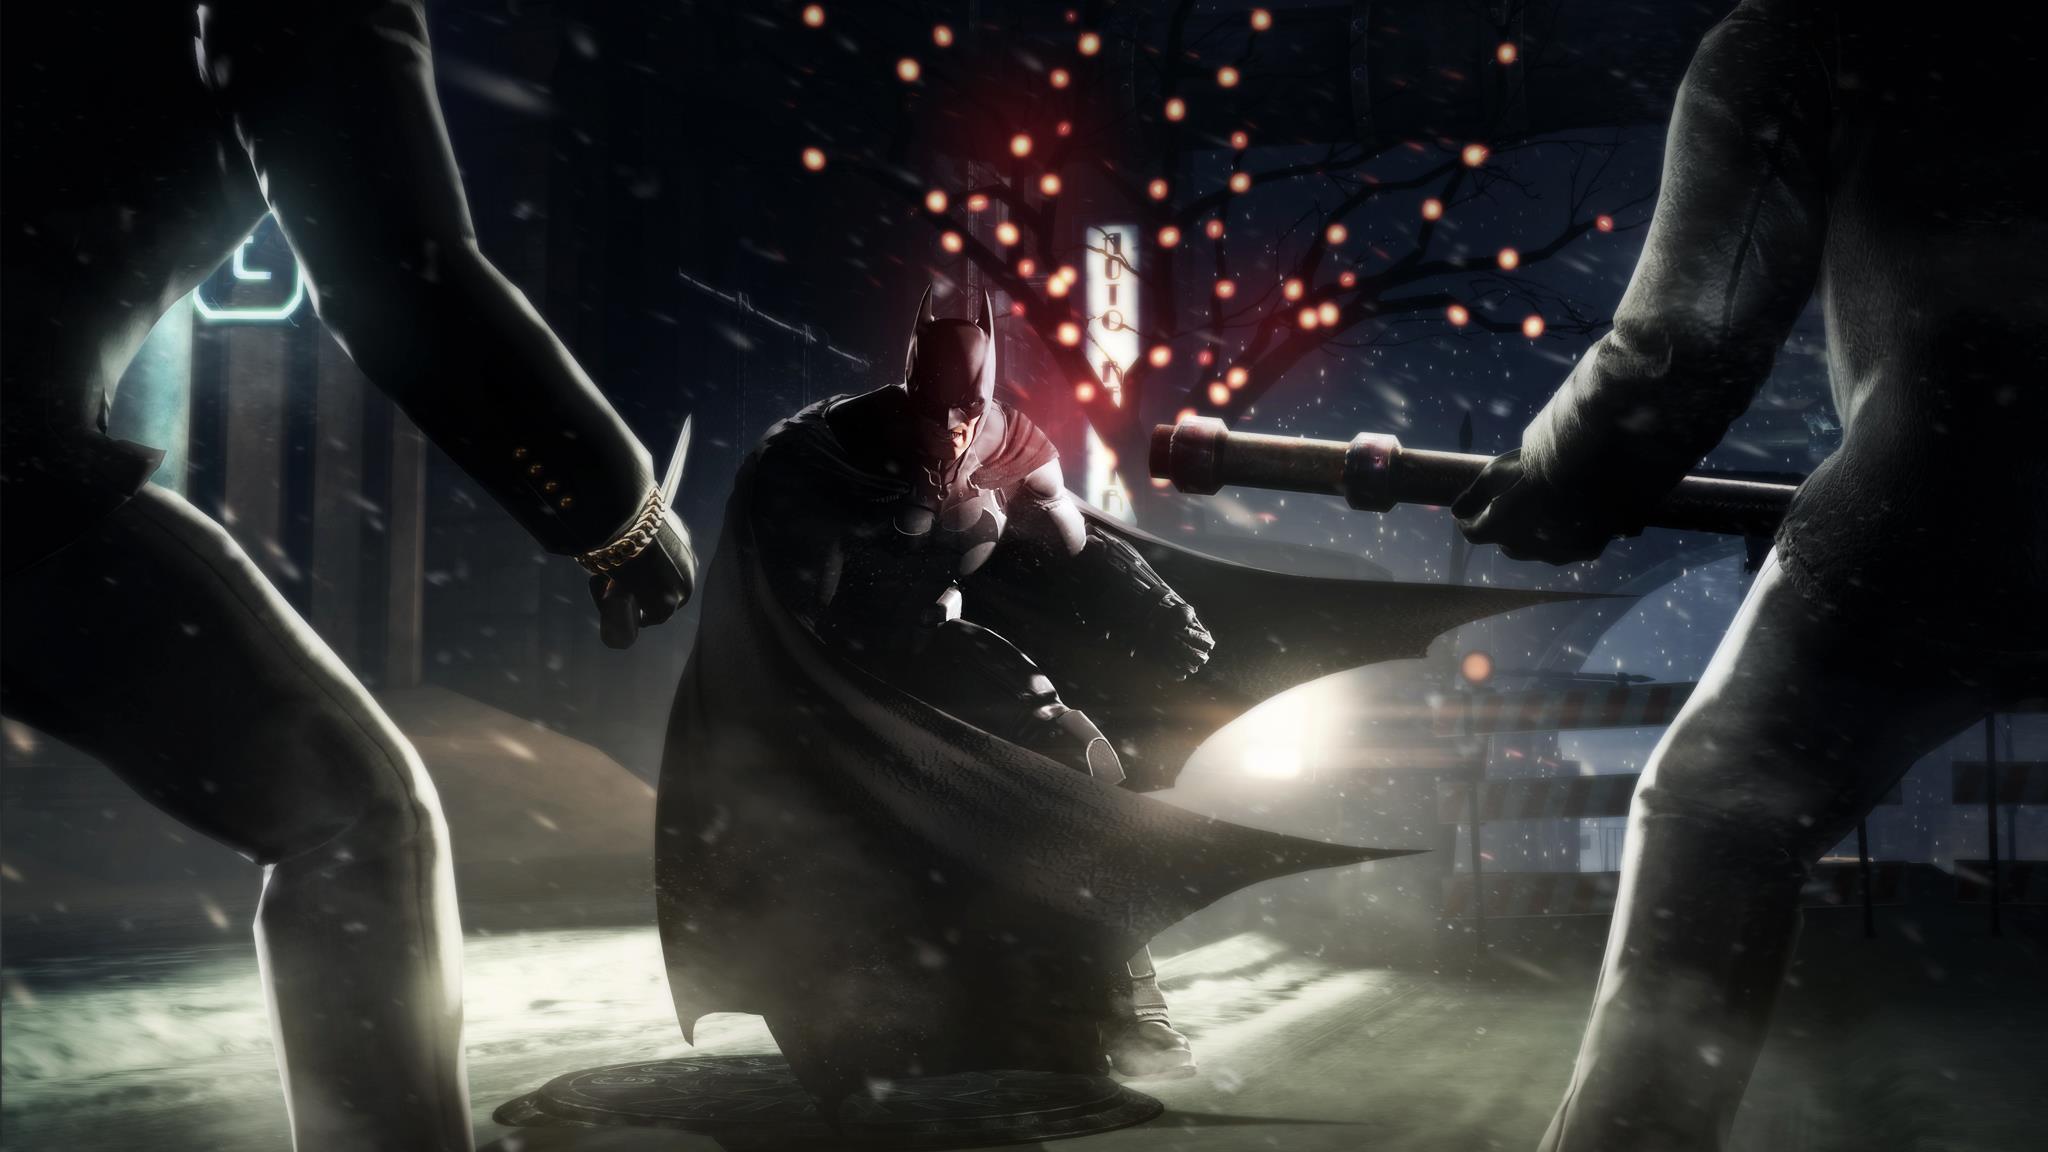 Batman: Arkham Origins Screenshots Are Full Of Christmas Cheer #26512